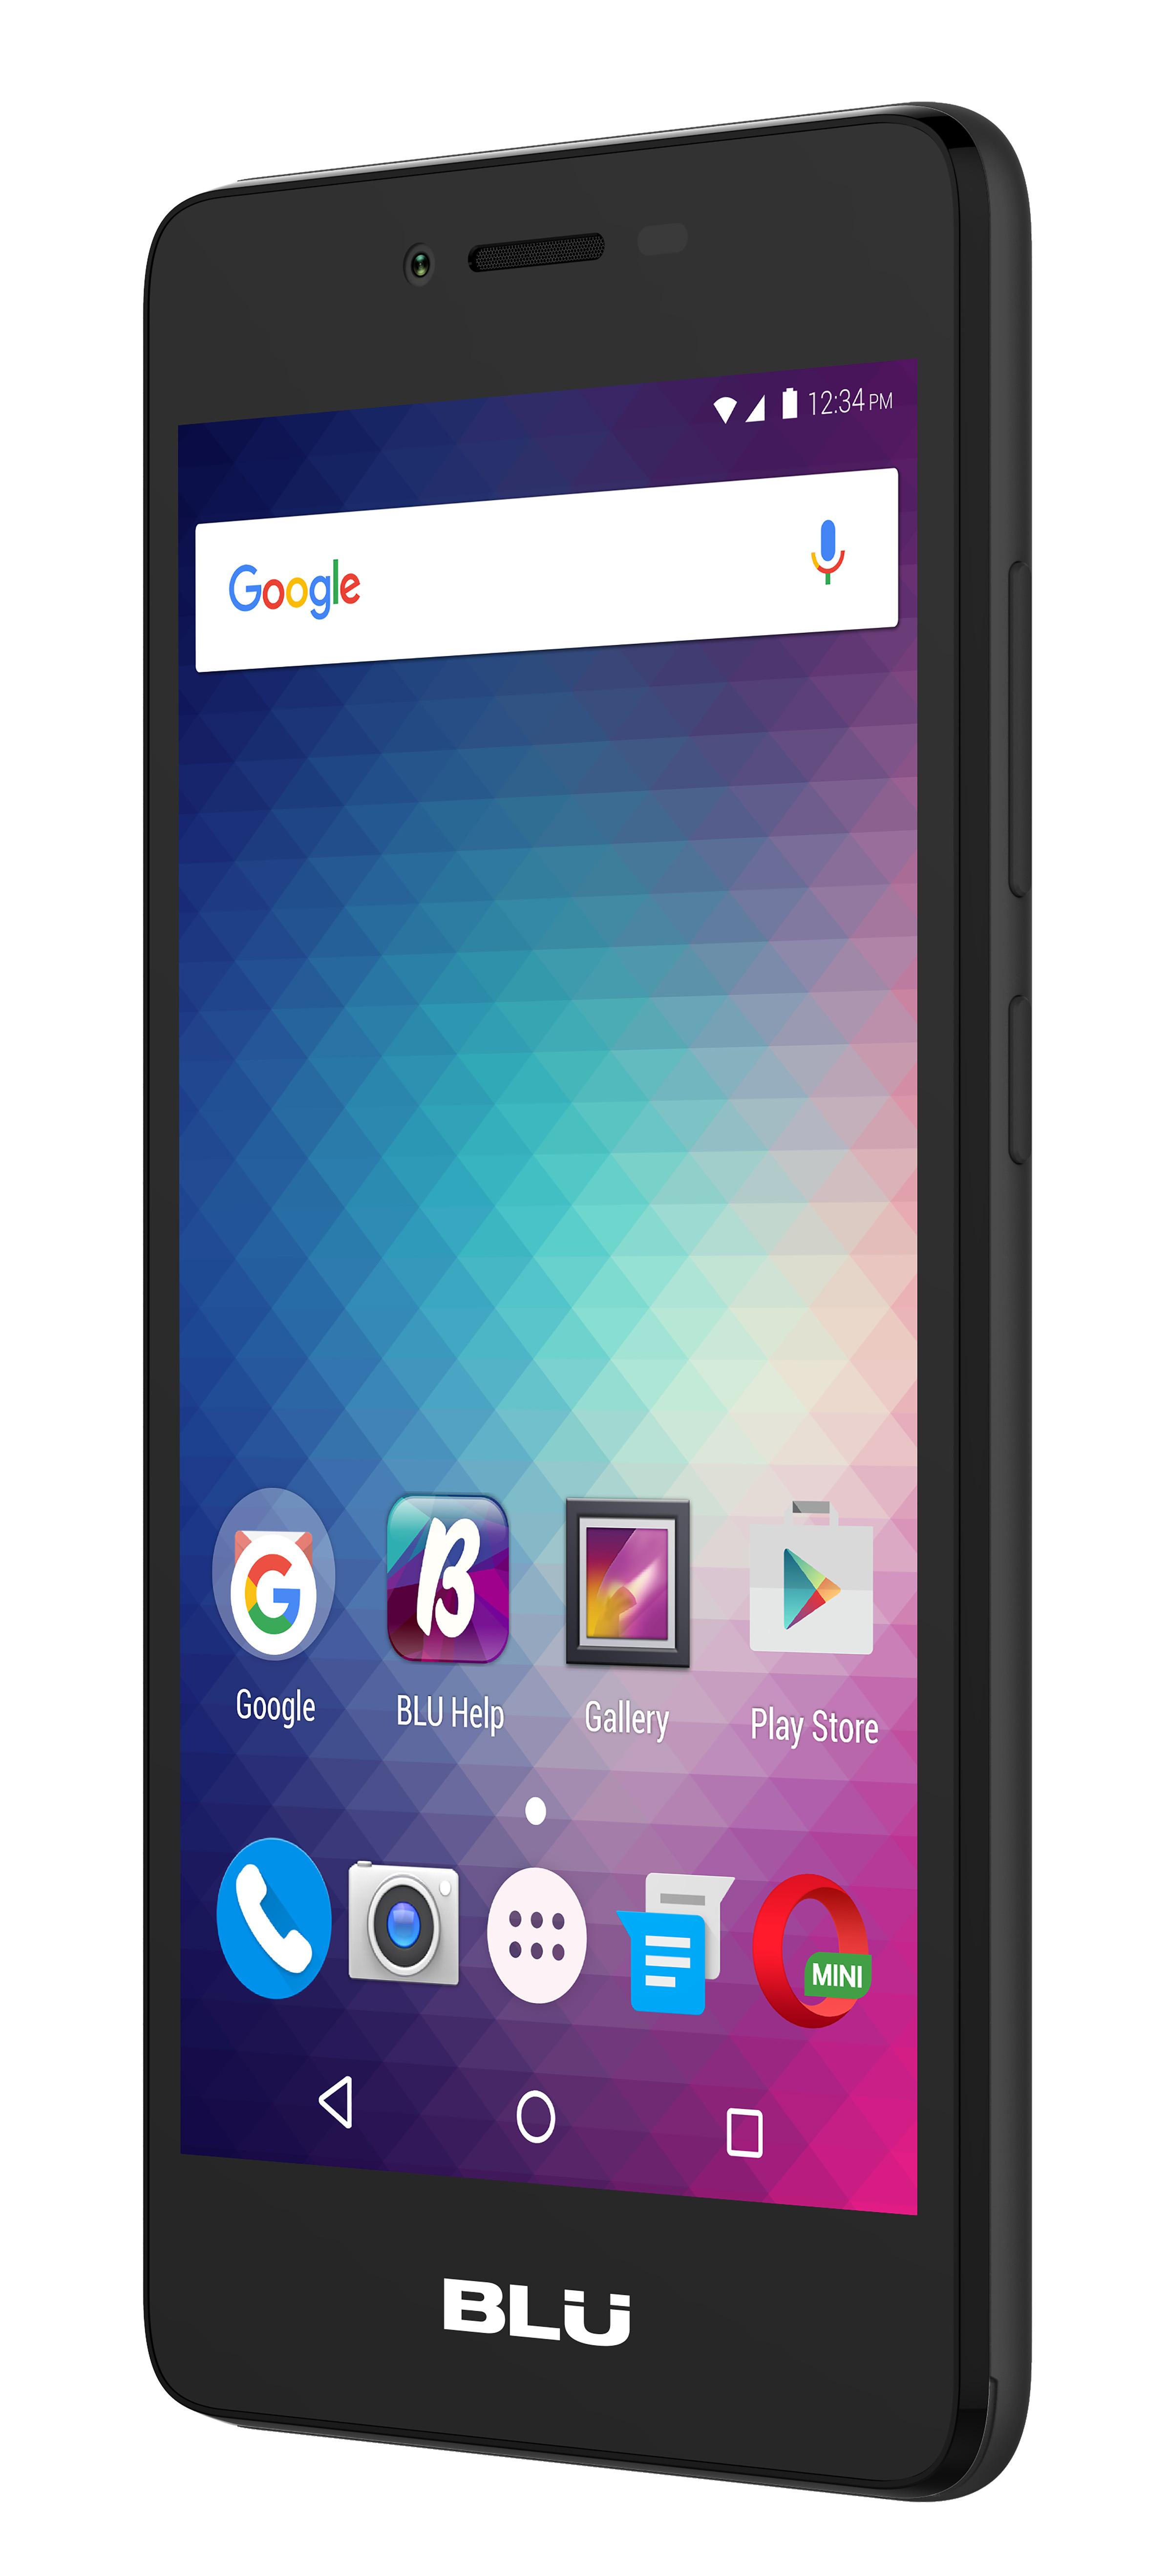 Camera Android G2 Phone blu studio g2 s010q unlocked gsm quad core android phone black core